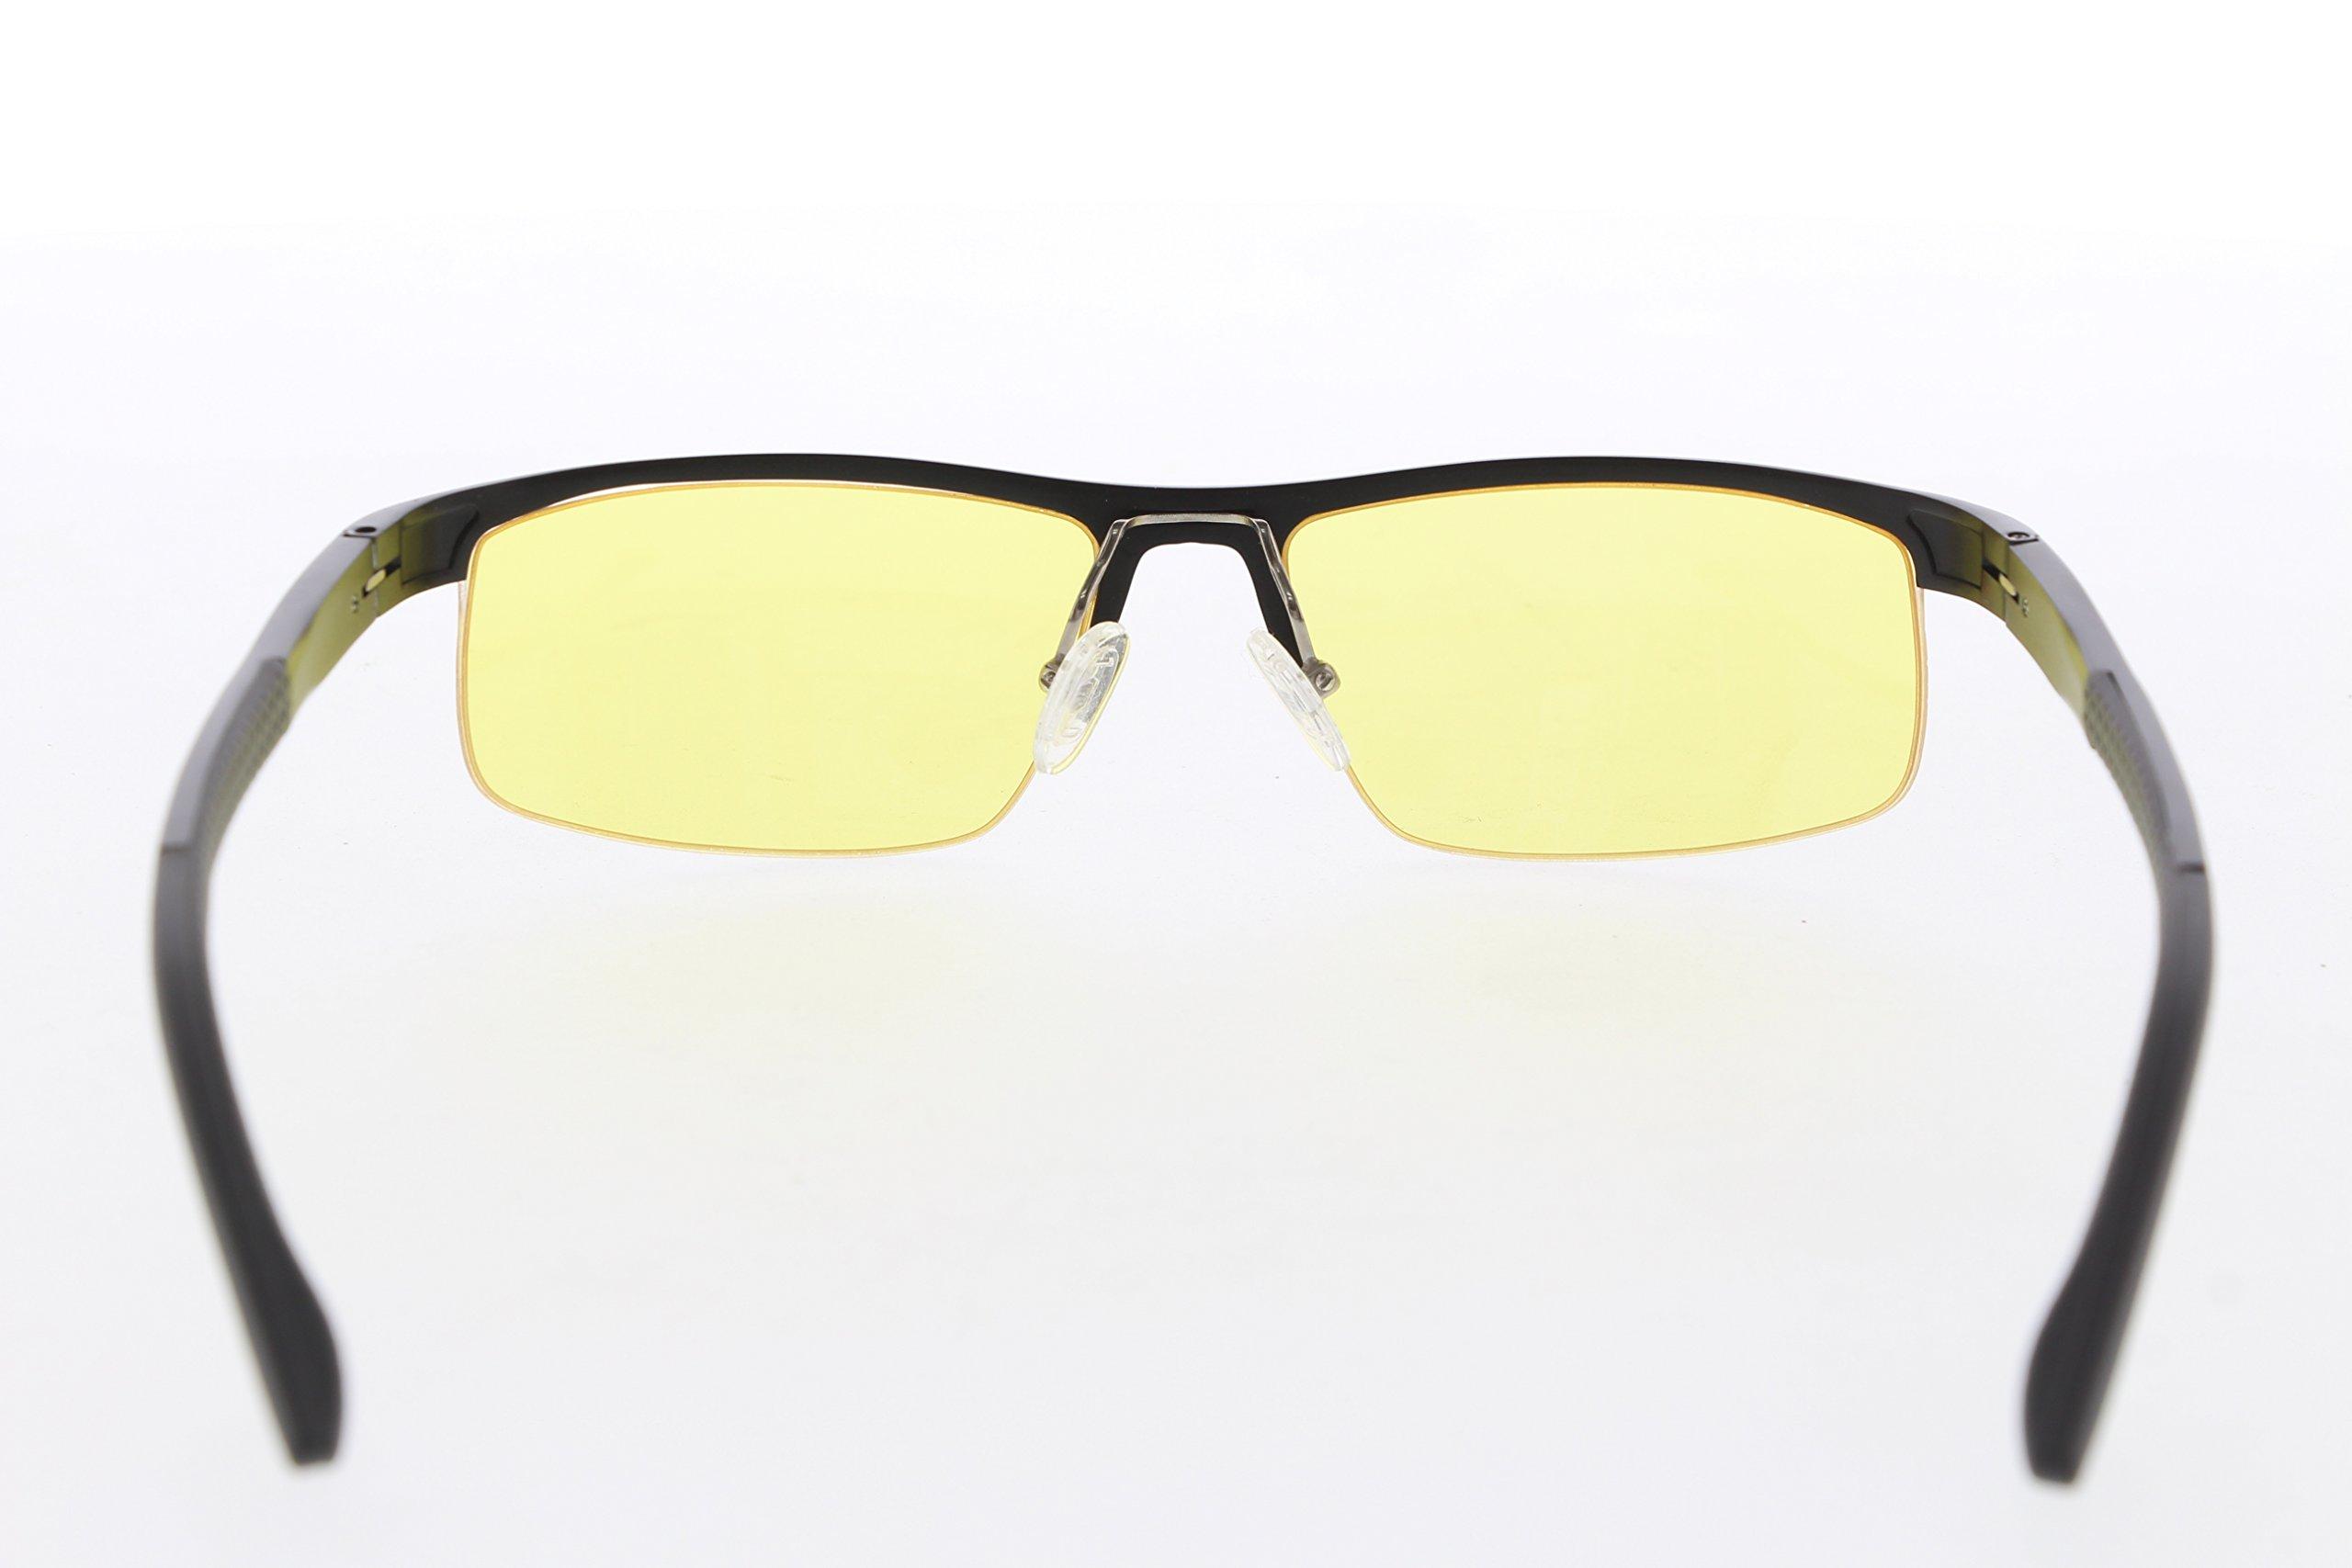 TNTi™ Billet Aluminum Frame eSport Pro Major League Gaming Glasses - Black Pearl by TNT interactive (Image #3)